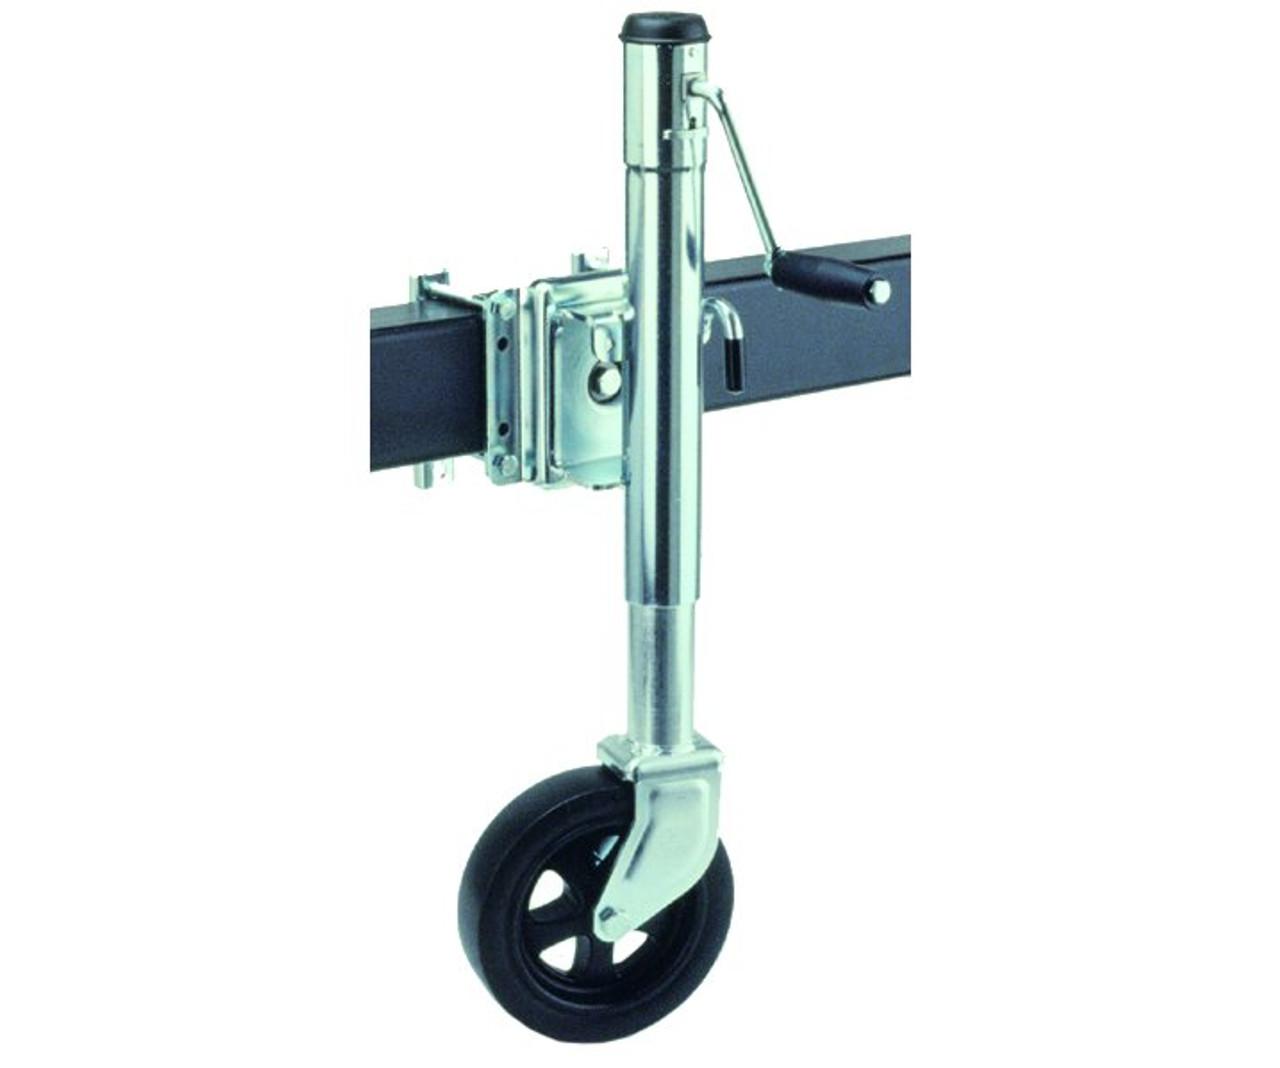 TJ1500 --- FULTON Swivel Sidewind Trailer Jack with Caster - 1,500 lb